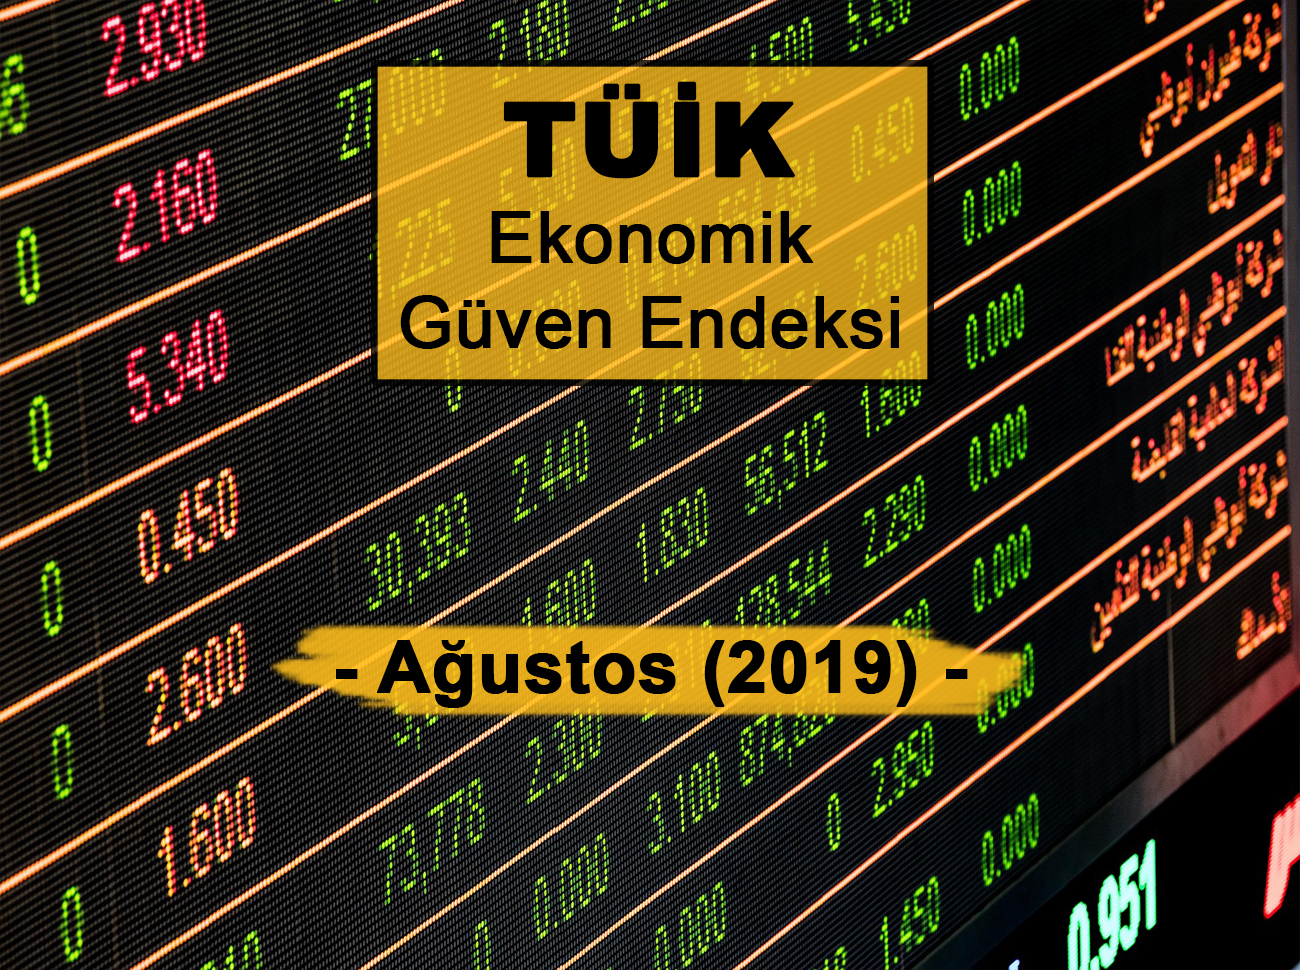 Ekonomik Güven Endeksi Ağustos 2019